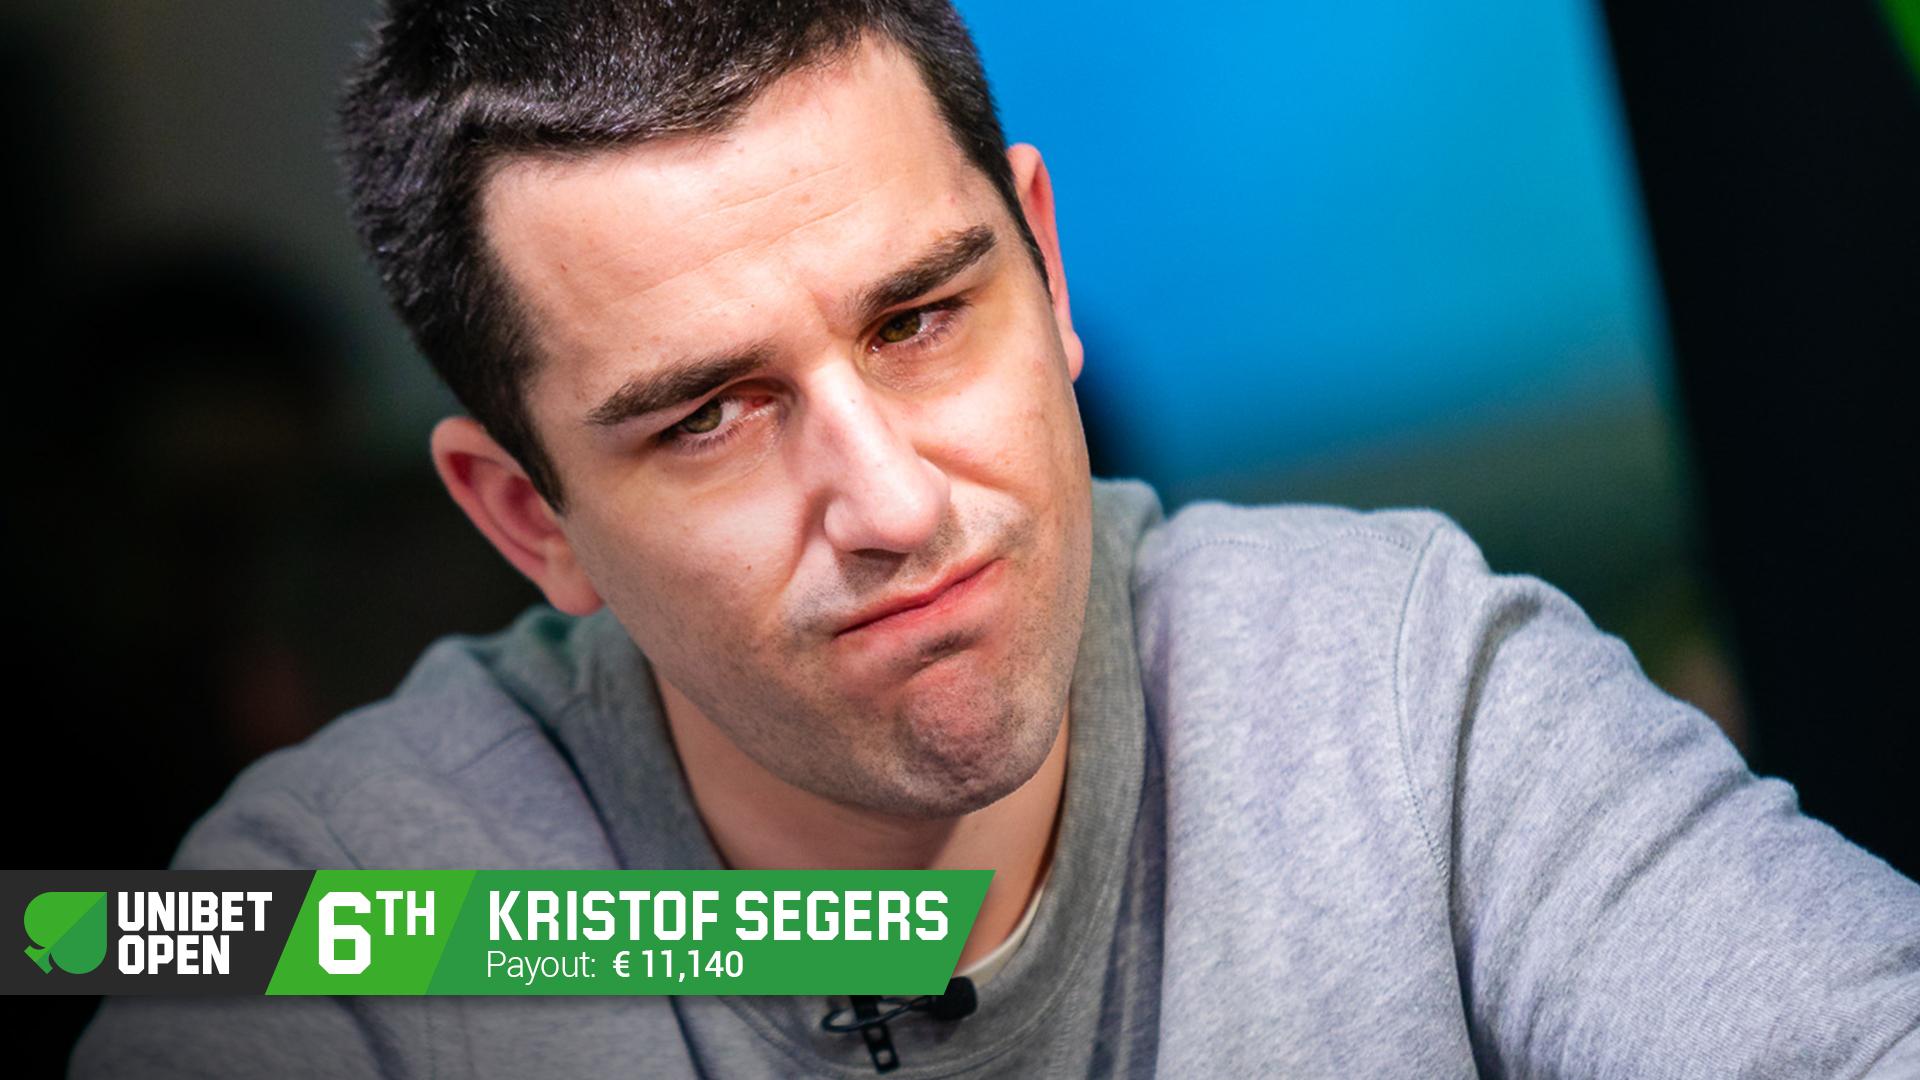 Kristof Segers